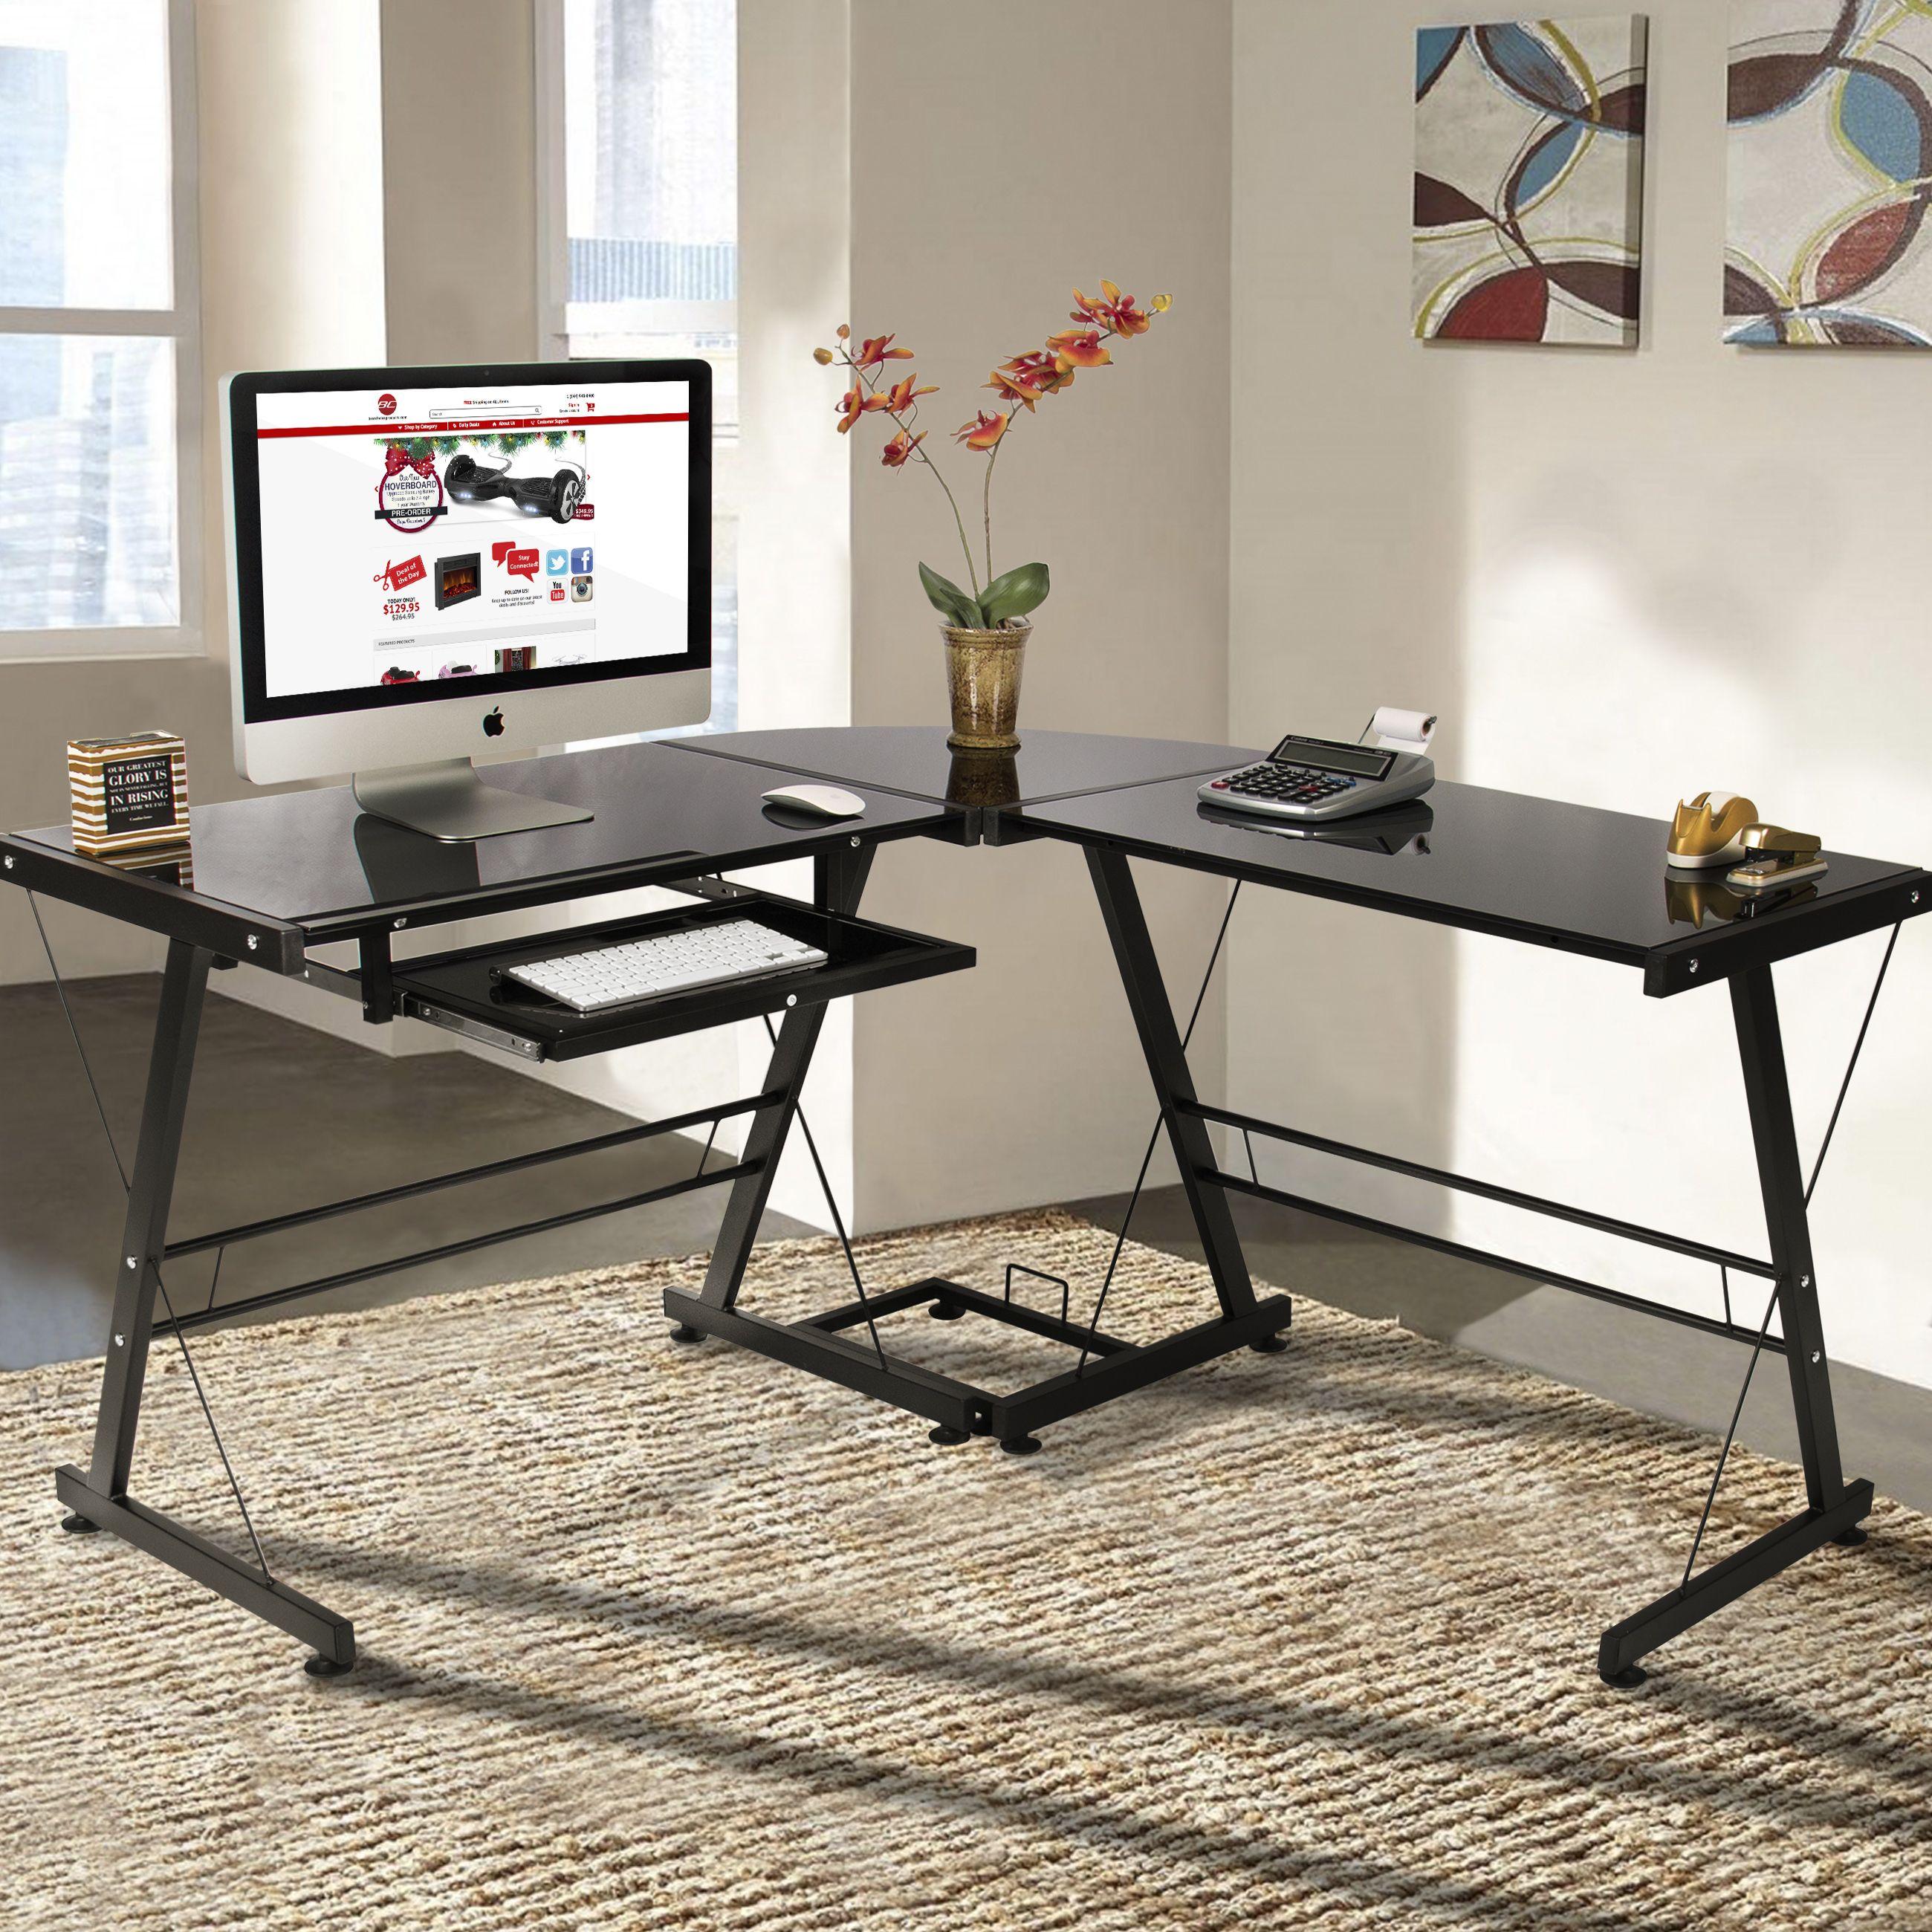 Laptop Table Office Depot